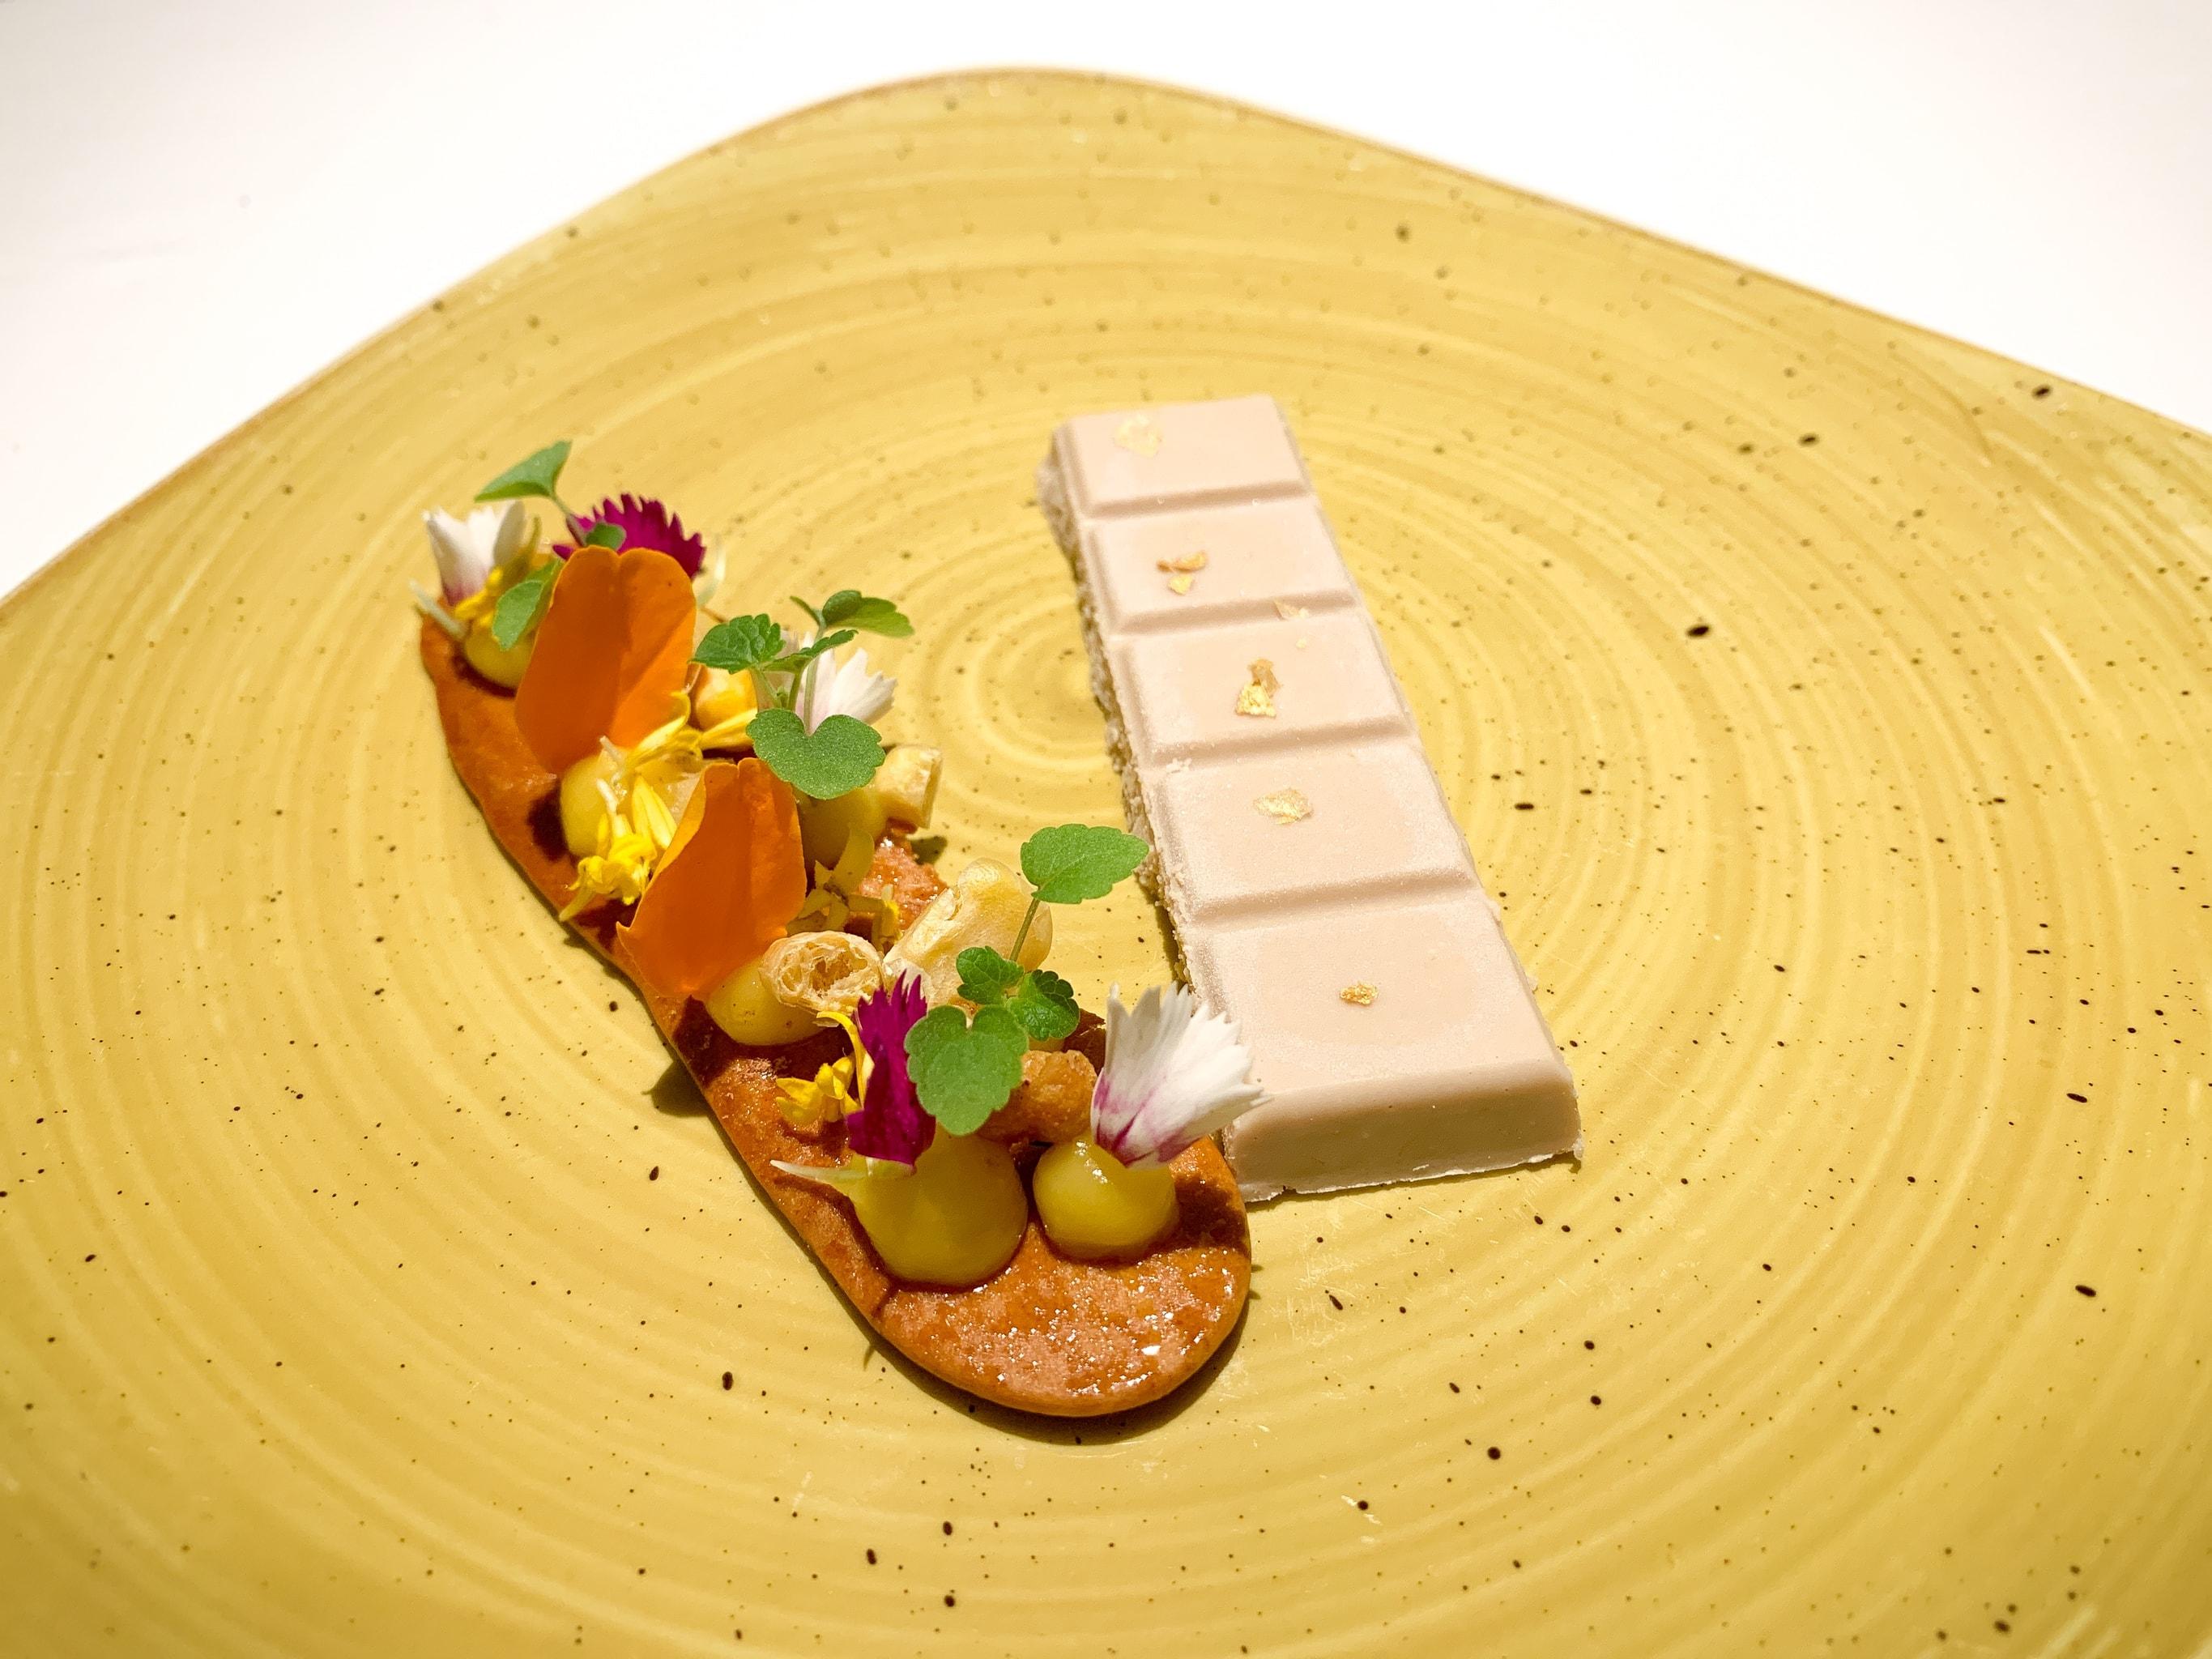 Duck foie gras, crunch sweet bread and corn textures